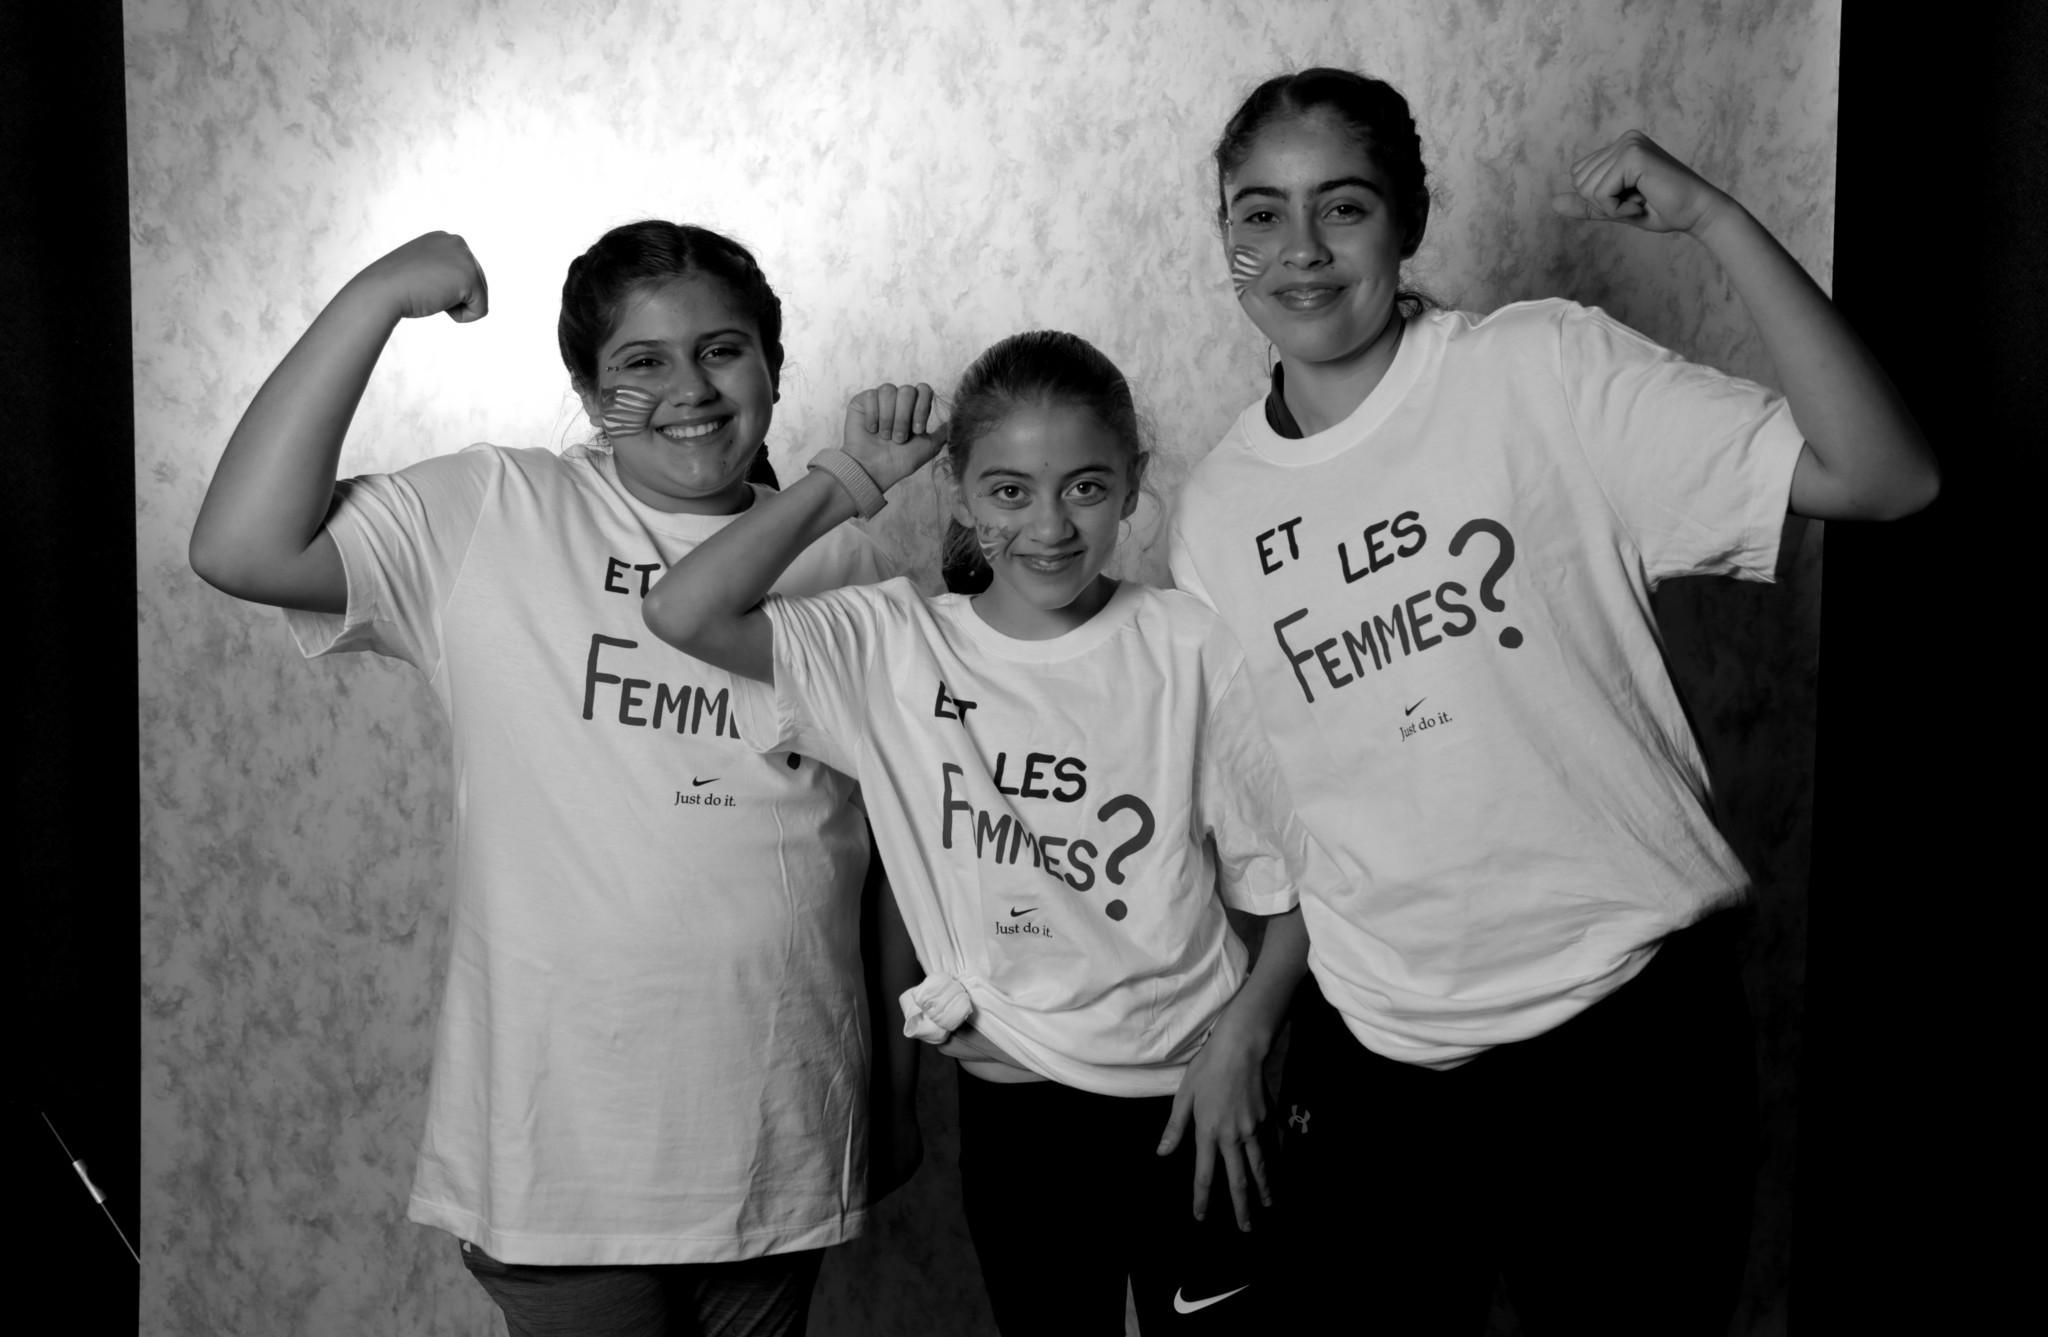 Viriemily Benitez, Aimee Benitez, and Valeria Benitez